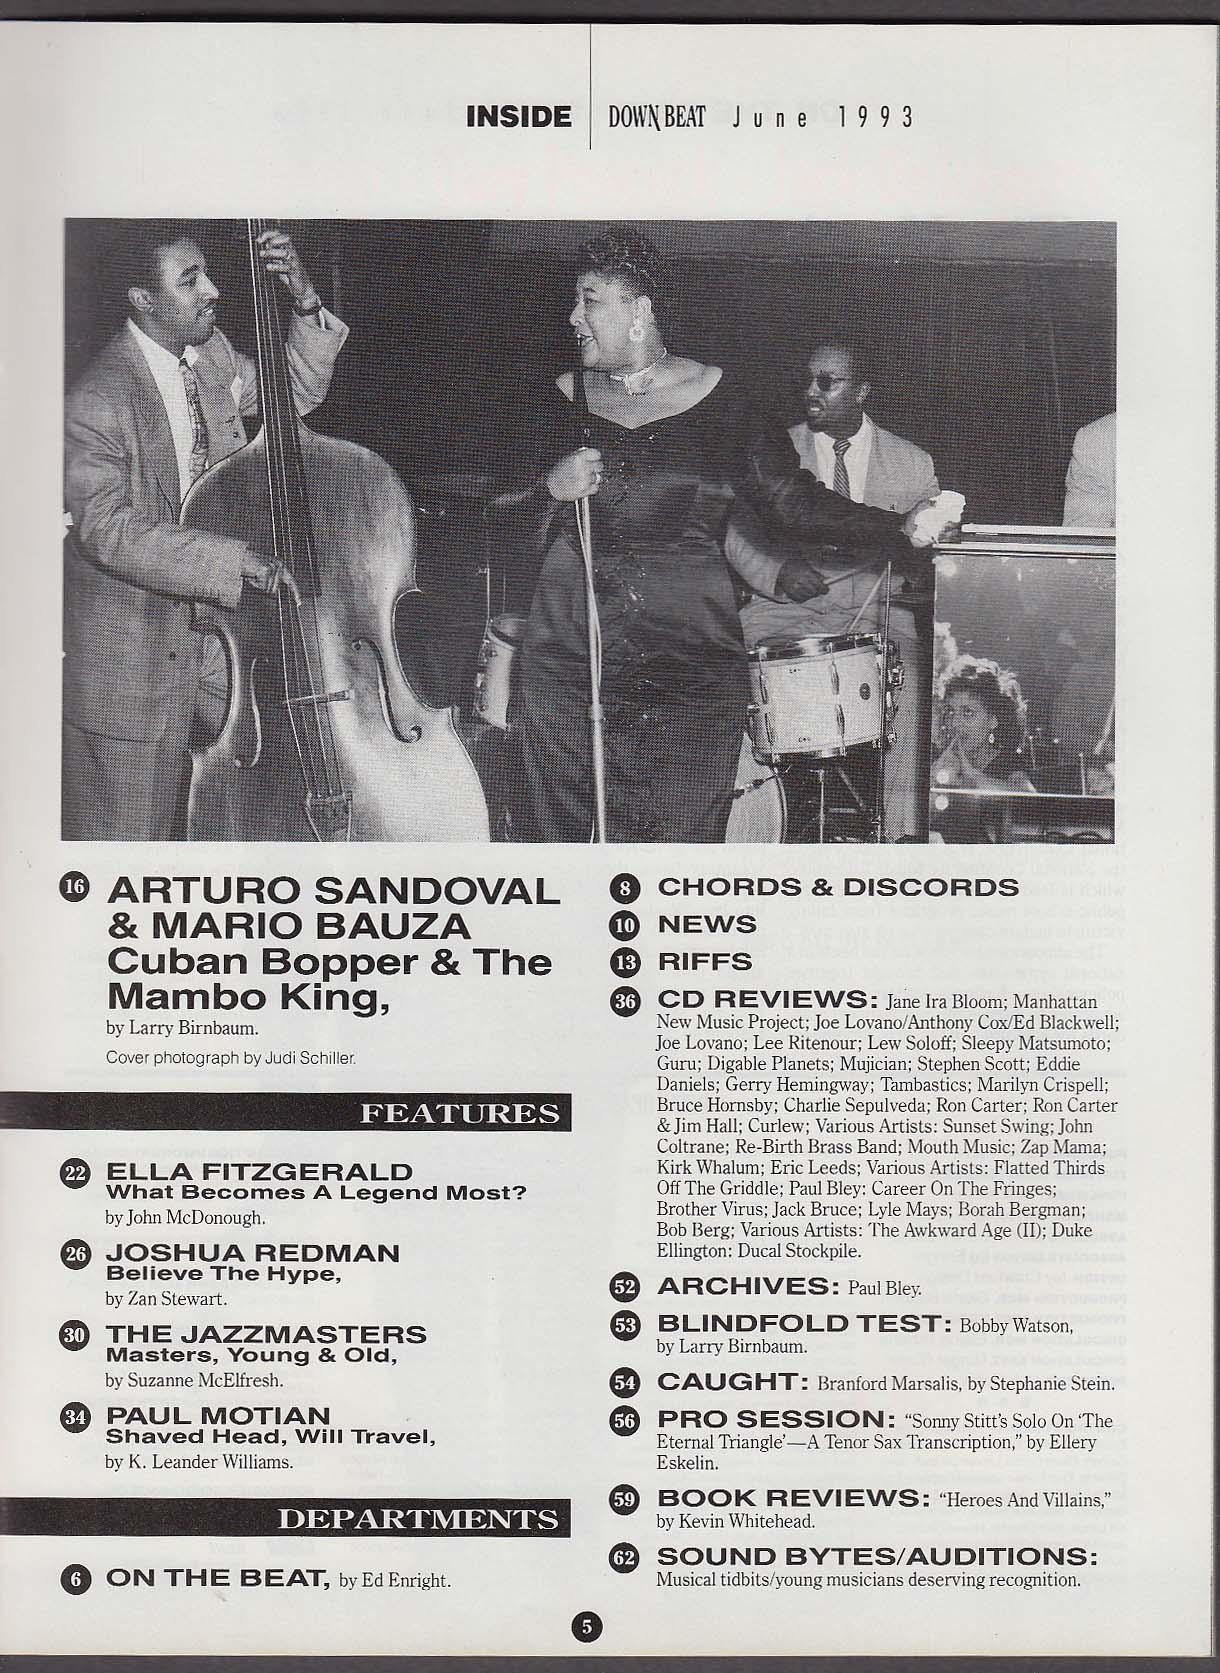 DOWN BEAT Arturo Sandoval Mario Bauza Paul Motian 6 1993